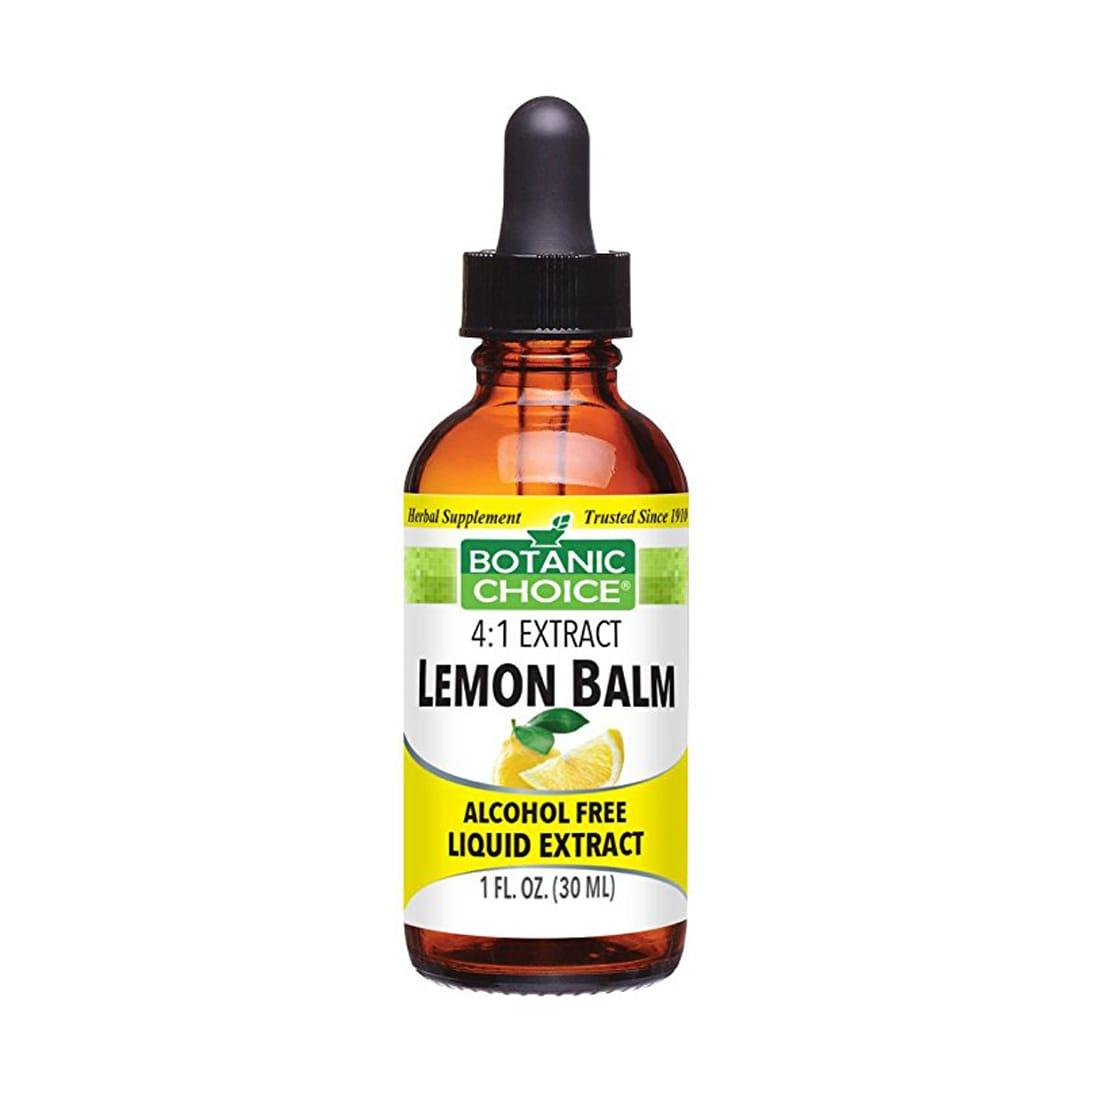 flower-of-life-botanic-choice-lemon-balm-bottle-front